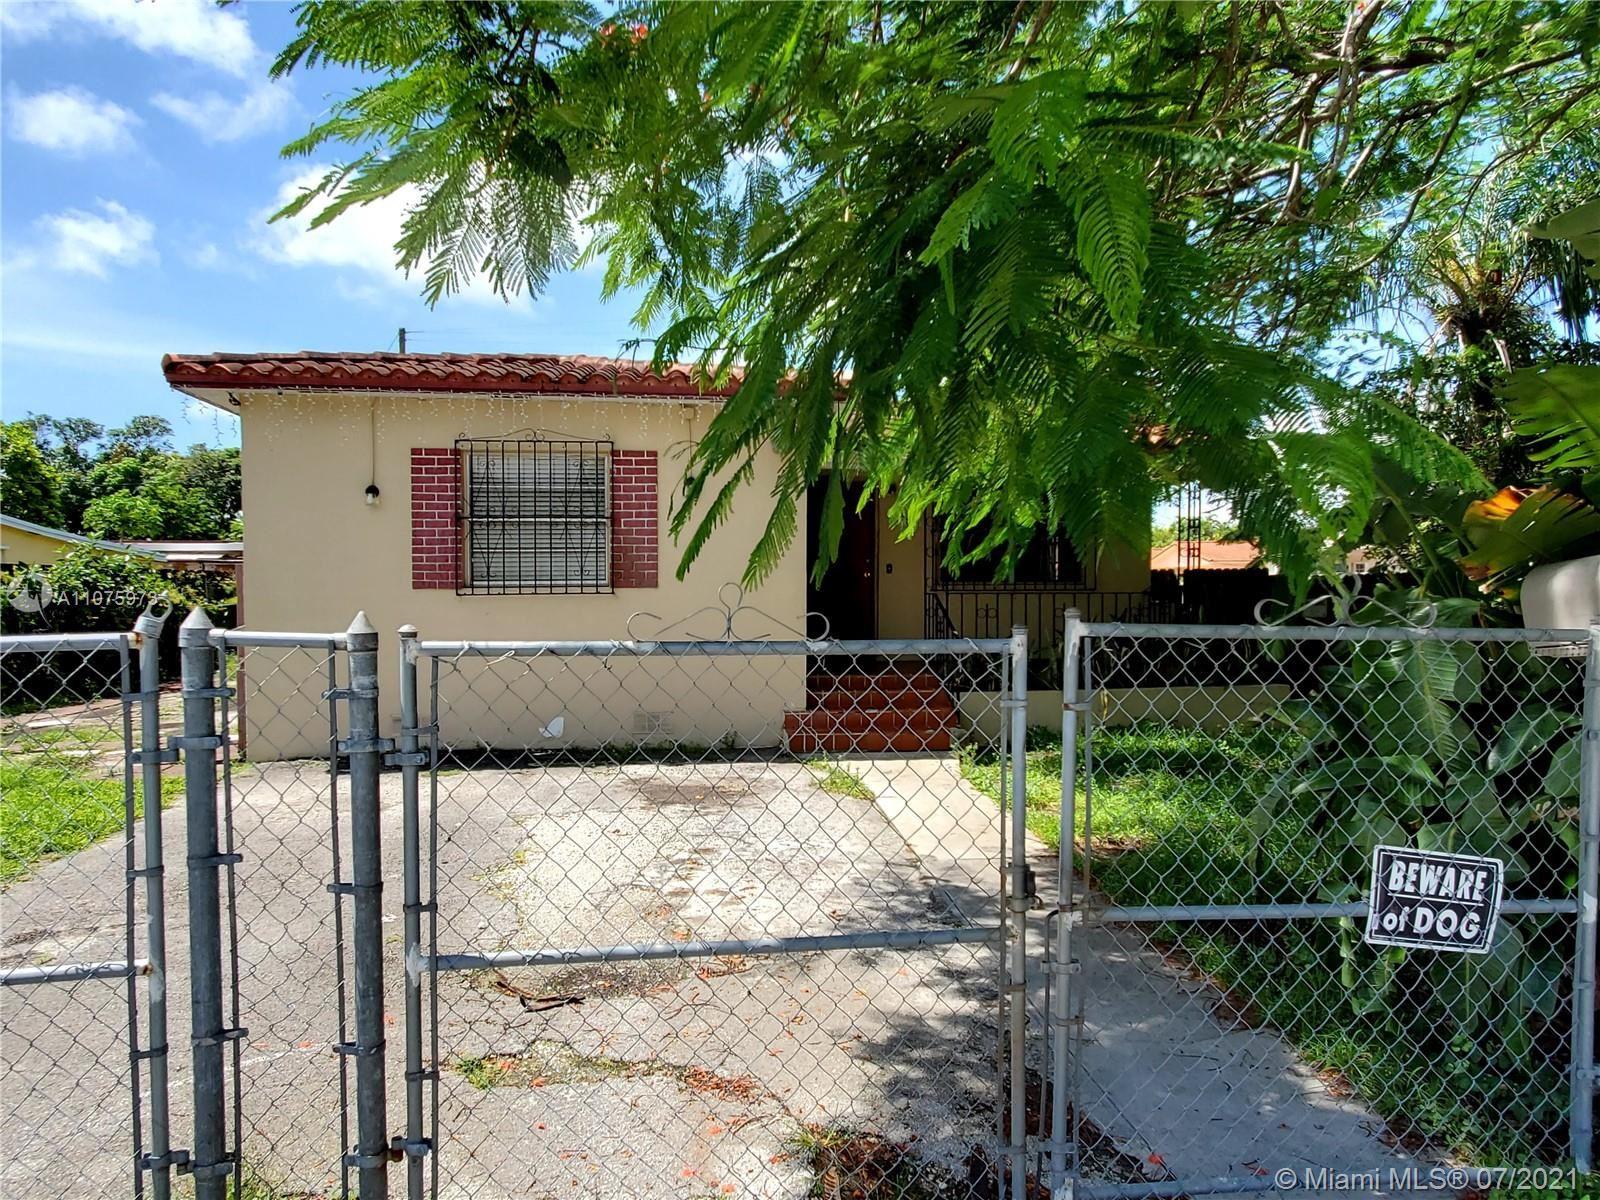 Photo of 5790 SW 20th St, Miami, FL 33155 (MLS # A11075973)